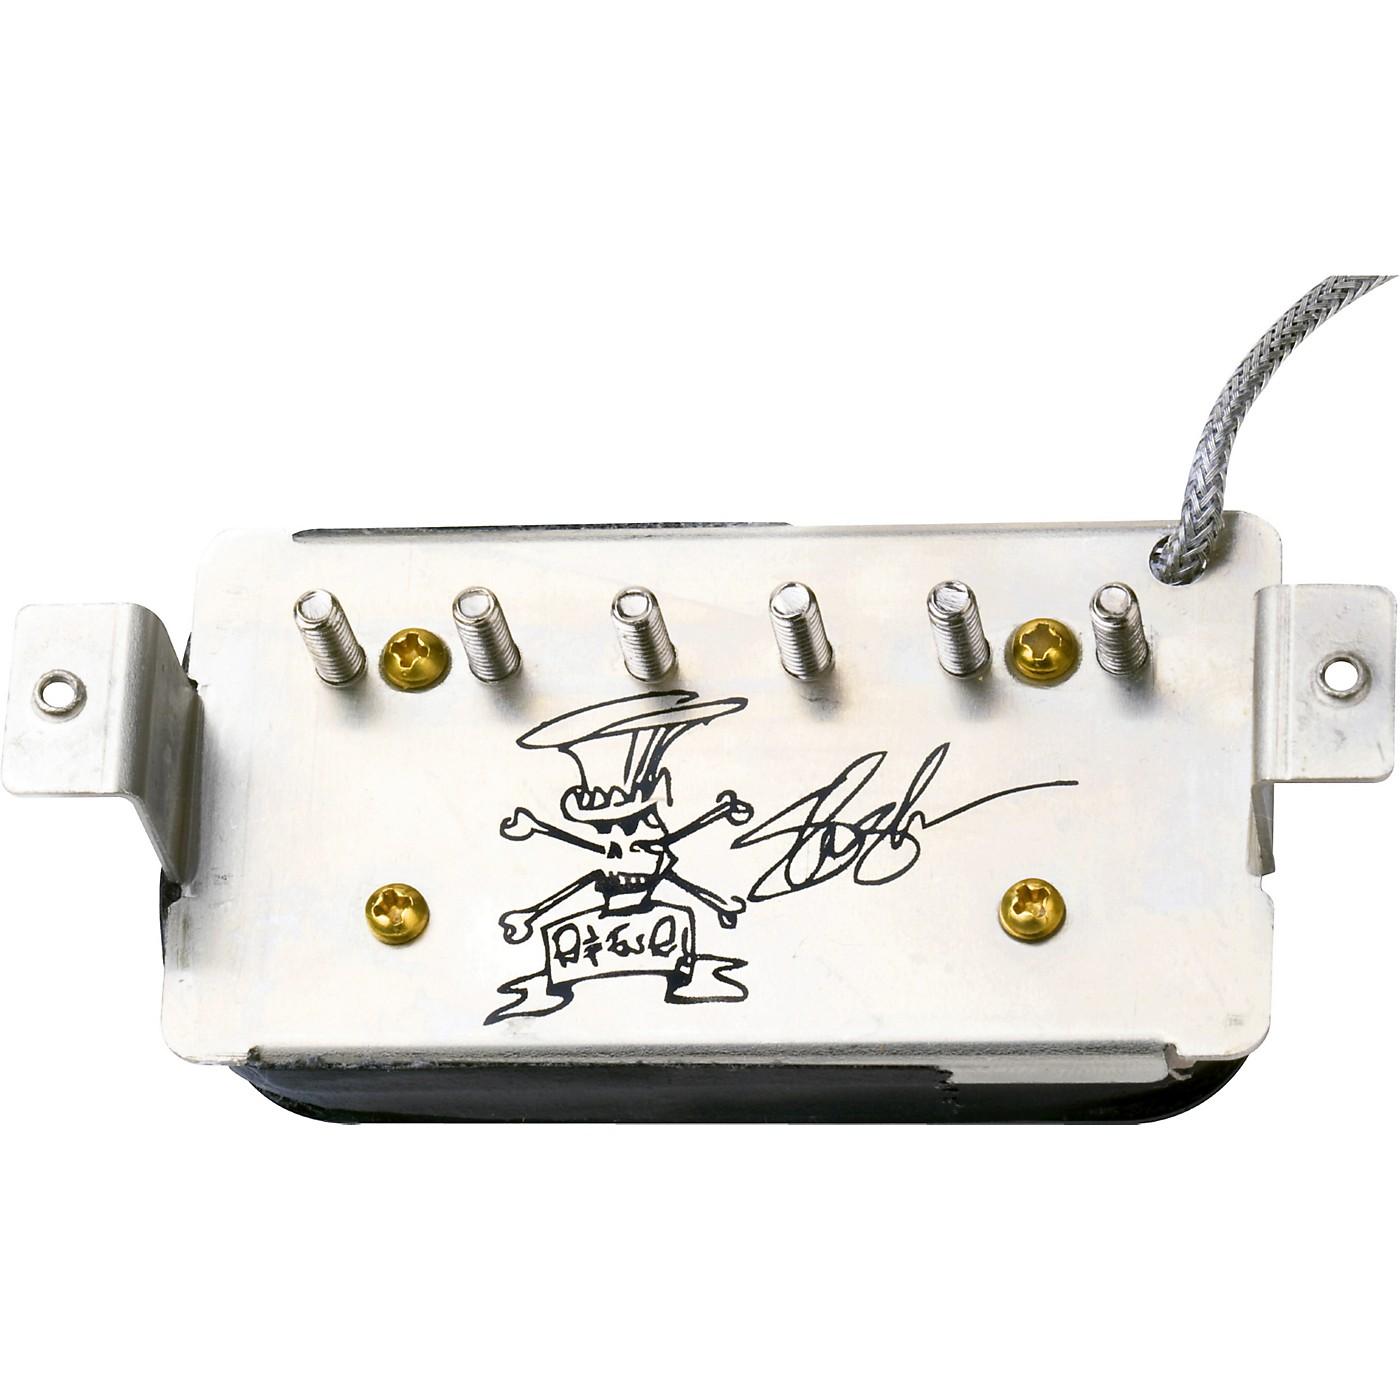 Seymour Duncan APH-2b Alnico II Pro Slash Bridge Humbucker Electric Guitar Bridge Pickup thumbnail